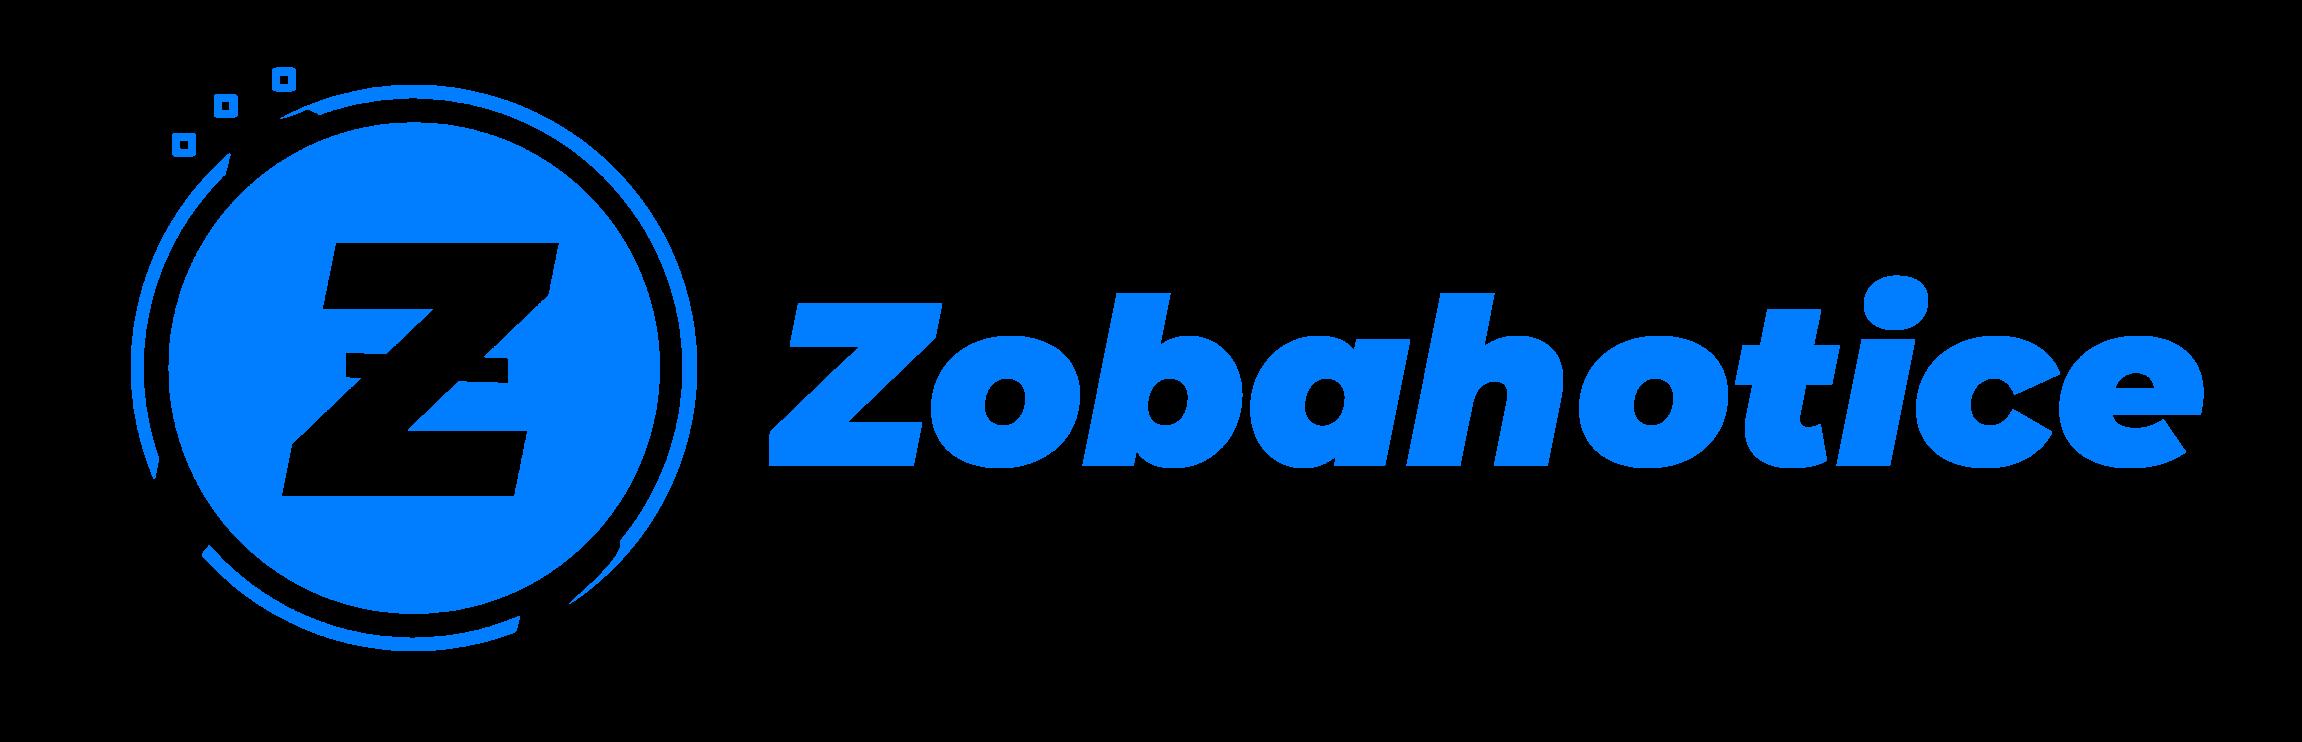 ZOBAHOTICE